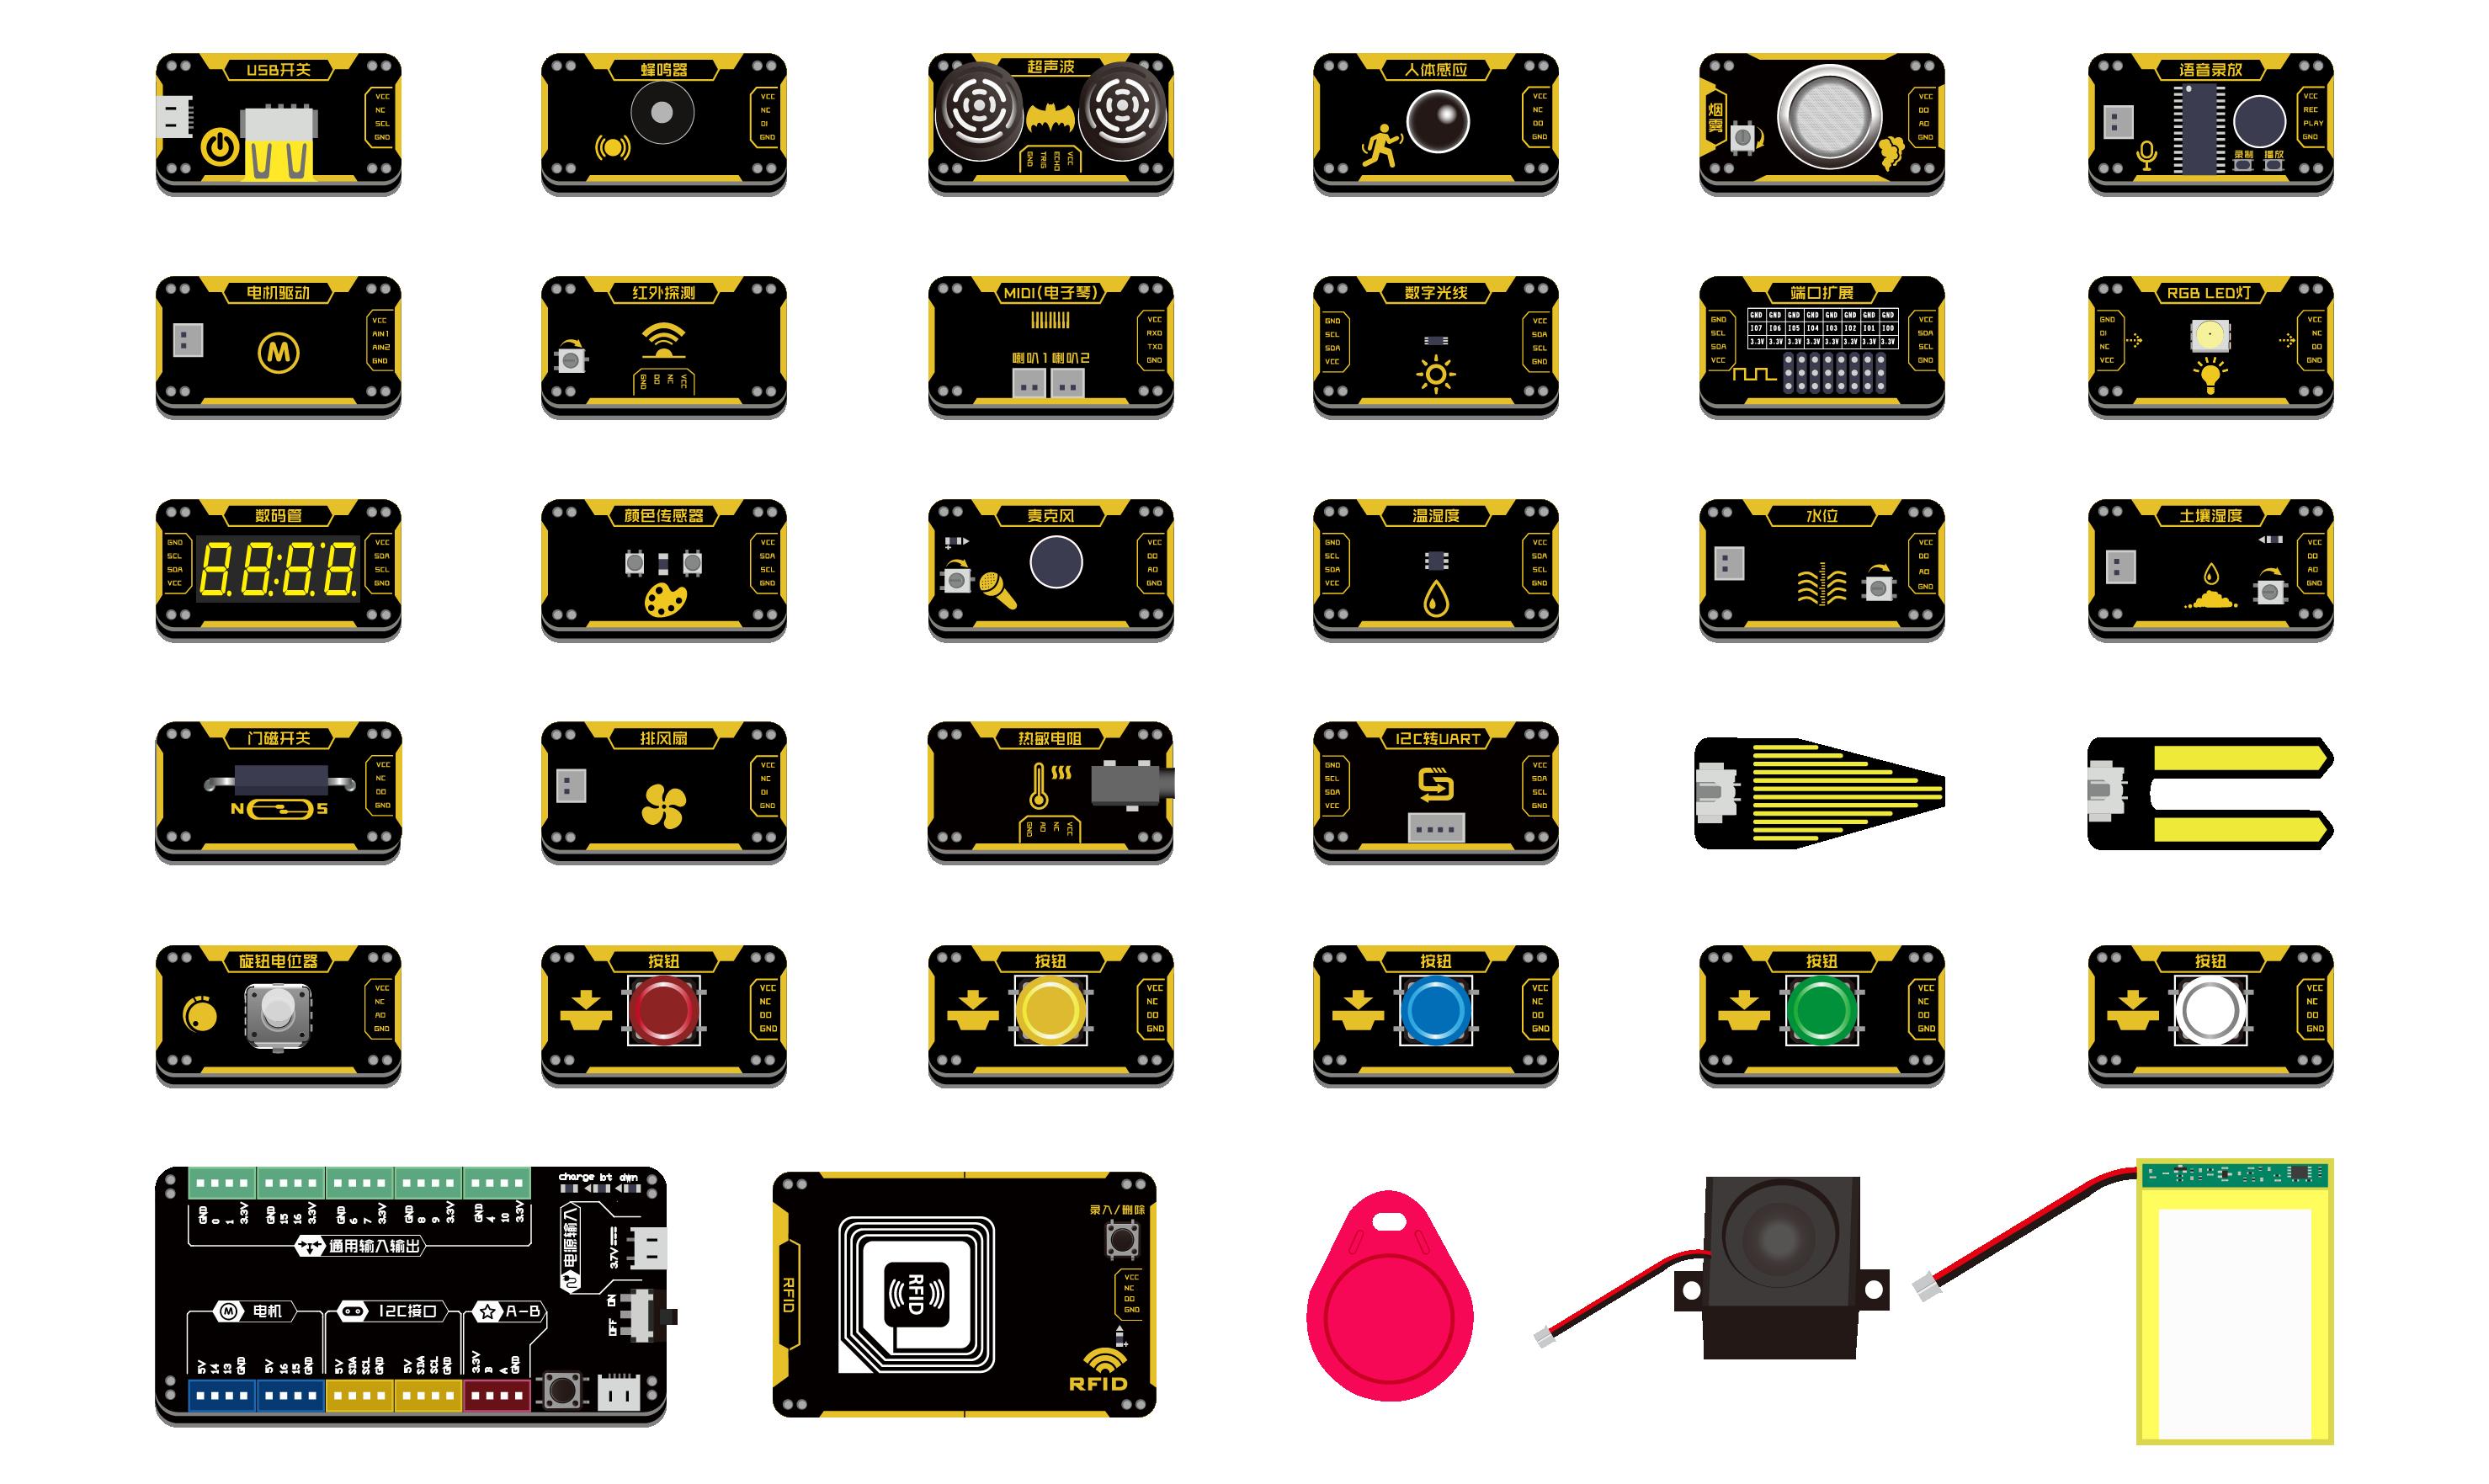 http://wiki.labplus.cn/images/0/07/Bluebit套件1.png